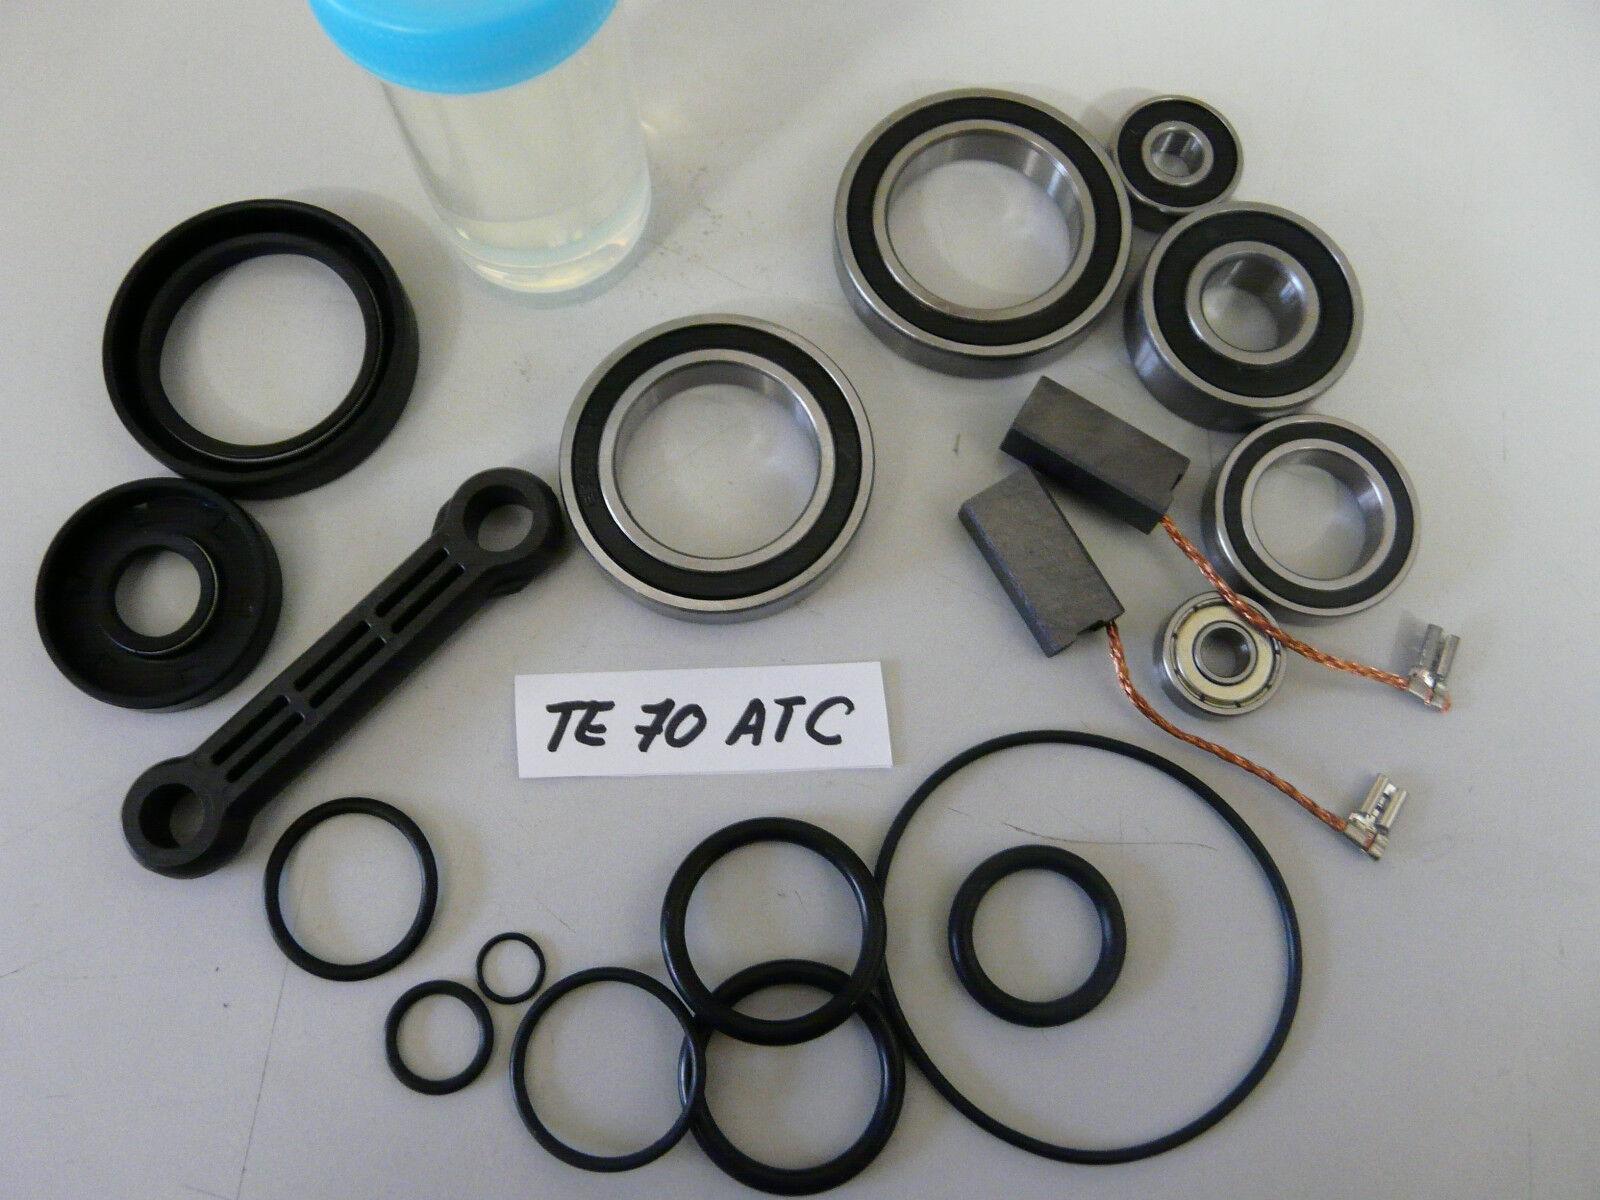 Hilti TE 70 ATC , Reparatursatz, Verschleissteilesatz, Wartungset+ Pleuel